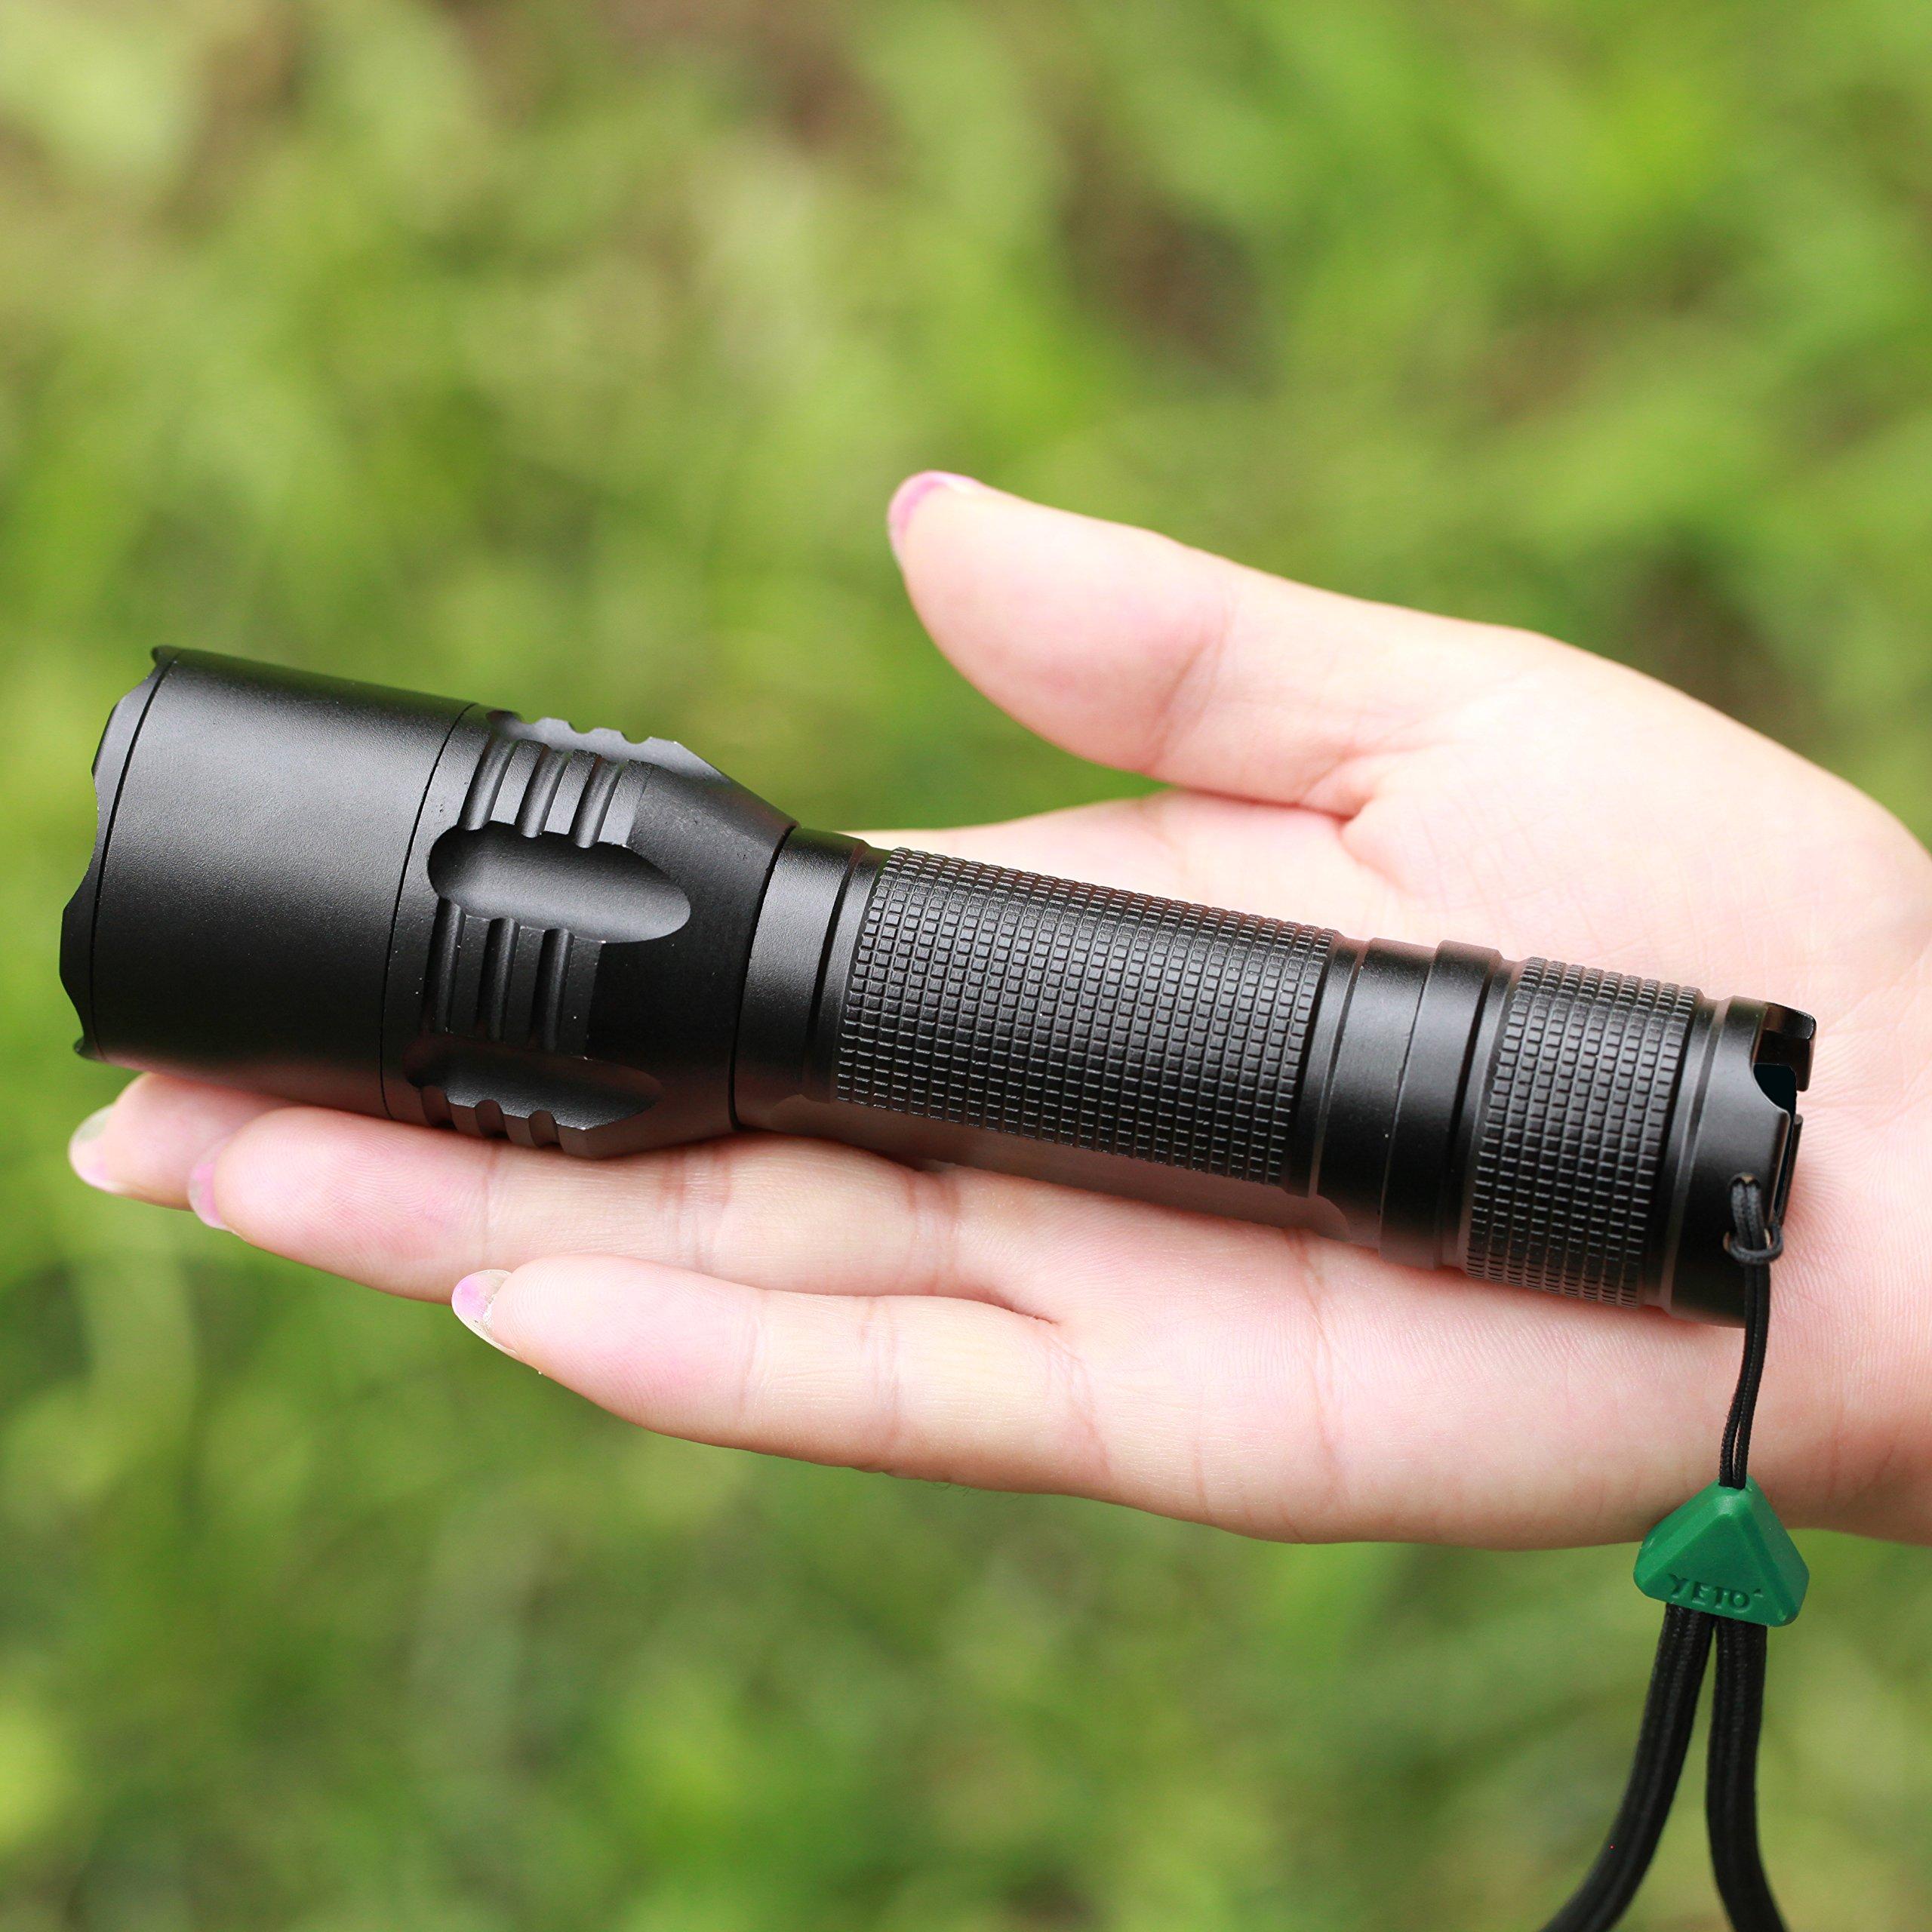 YETO Three-modes CREE XML-2 8W LED Self-defense Bezel Handheld Flashlight Torch